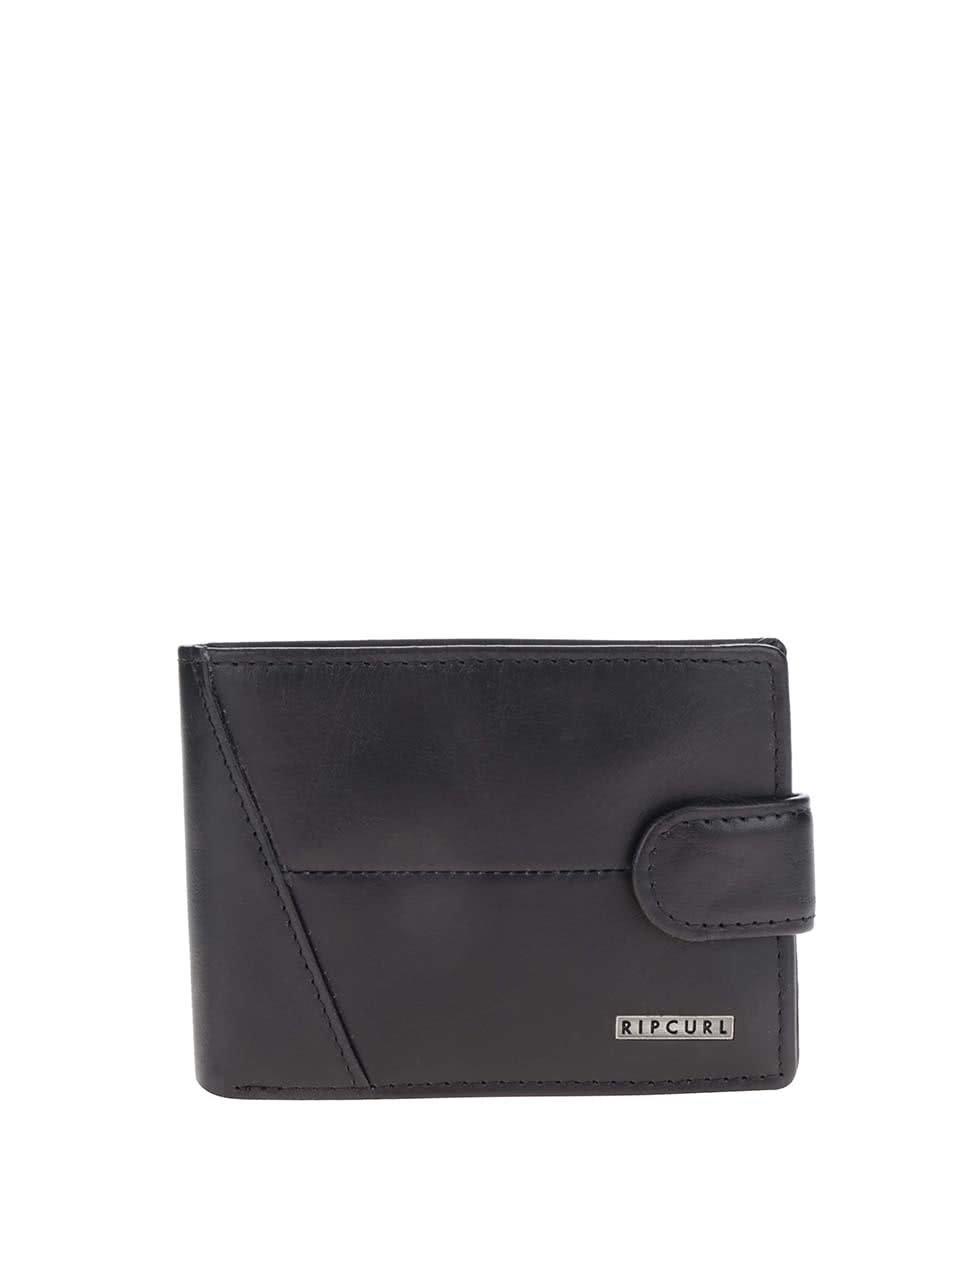 Černá pánská kožená peněženka s logem Rip Curl Clean All Day